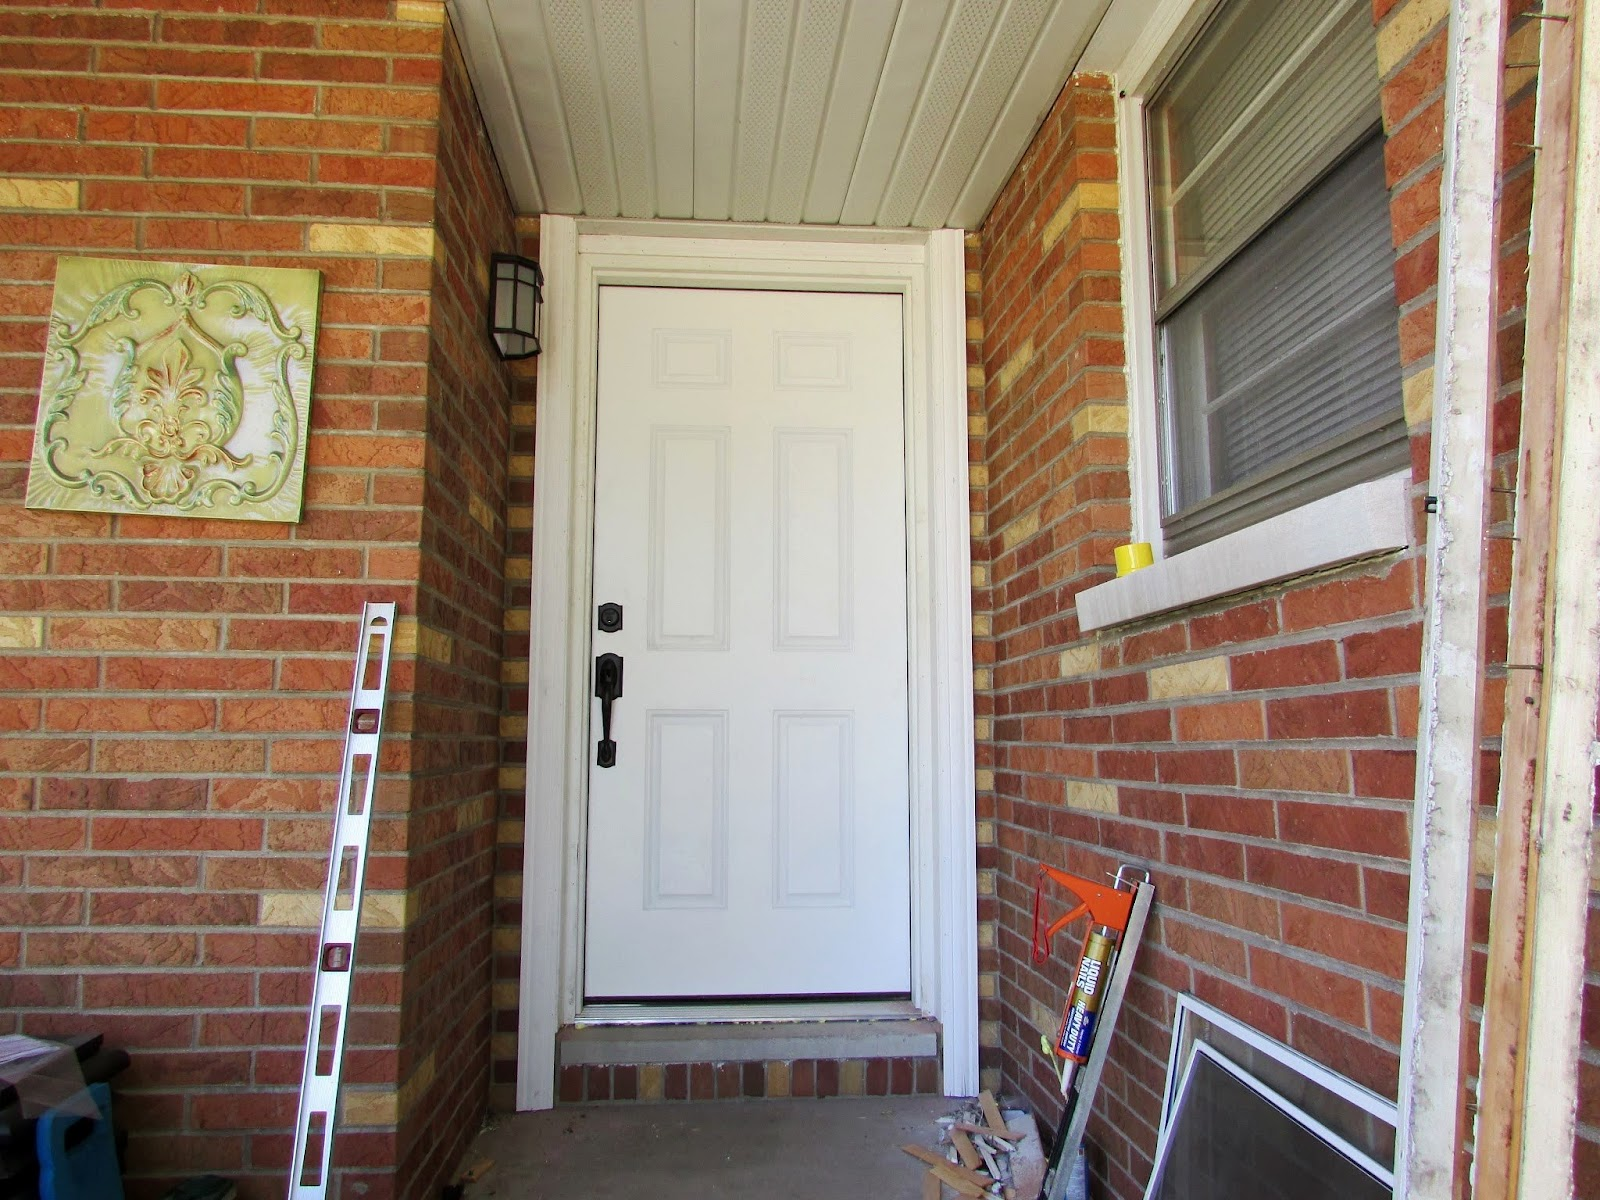 Installing a new front door diy project rustic refined for Installing brick molding for exterior doors